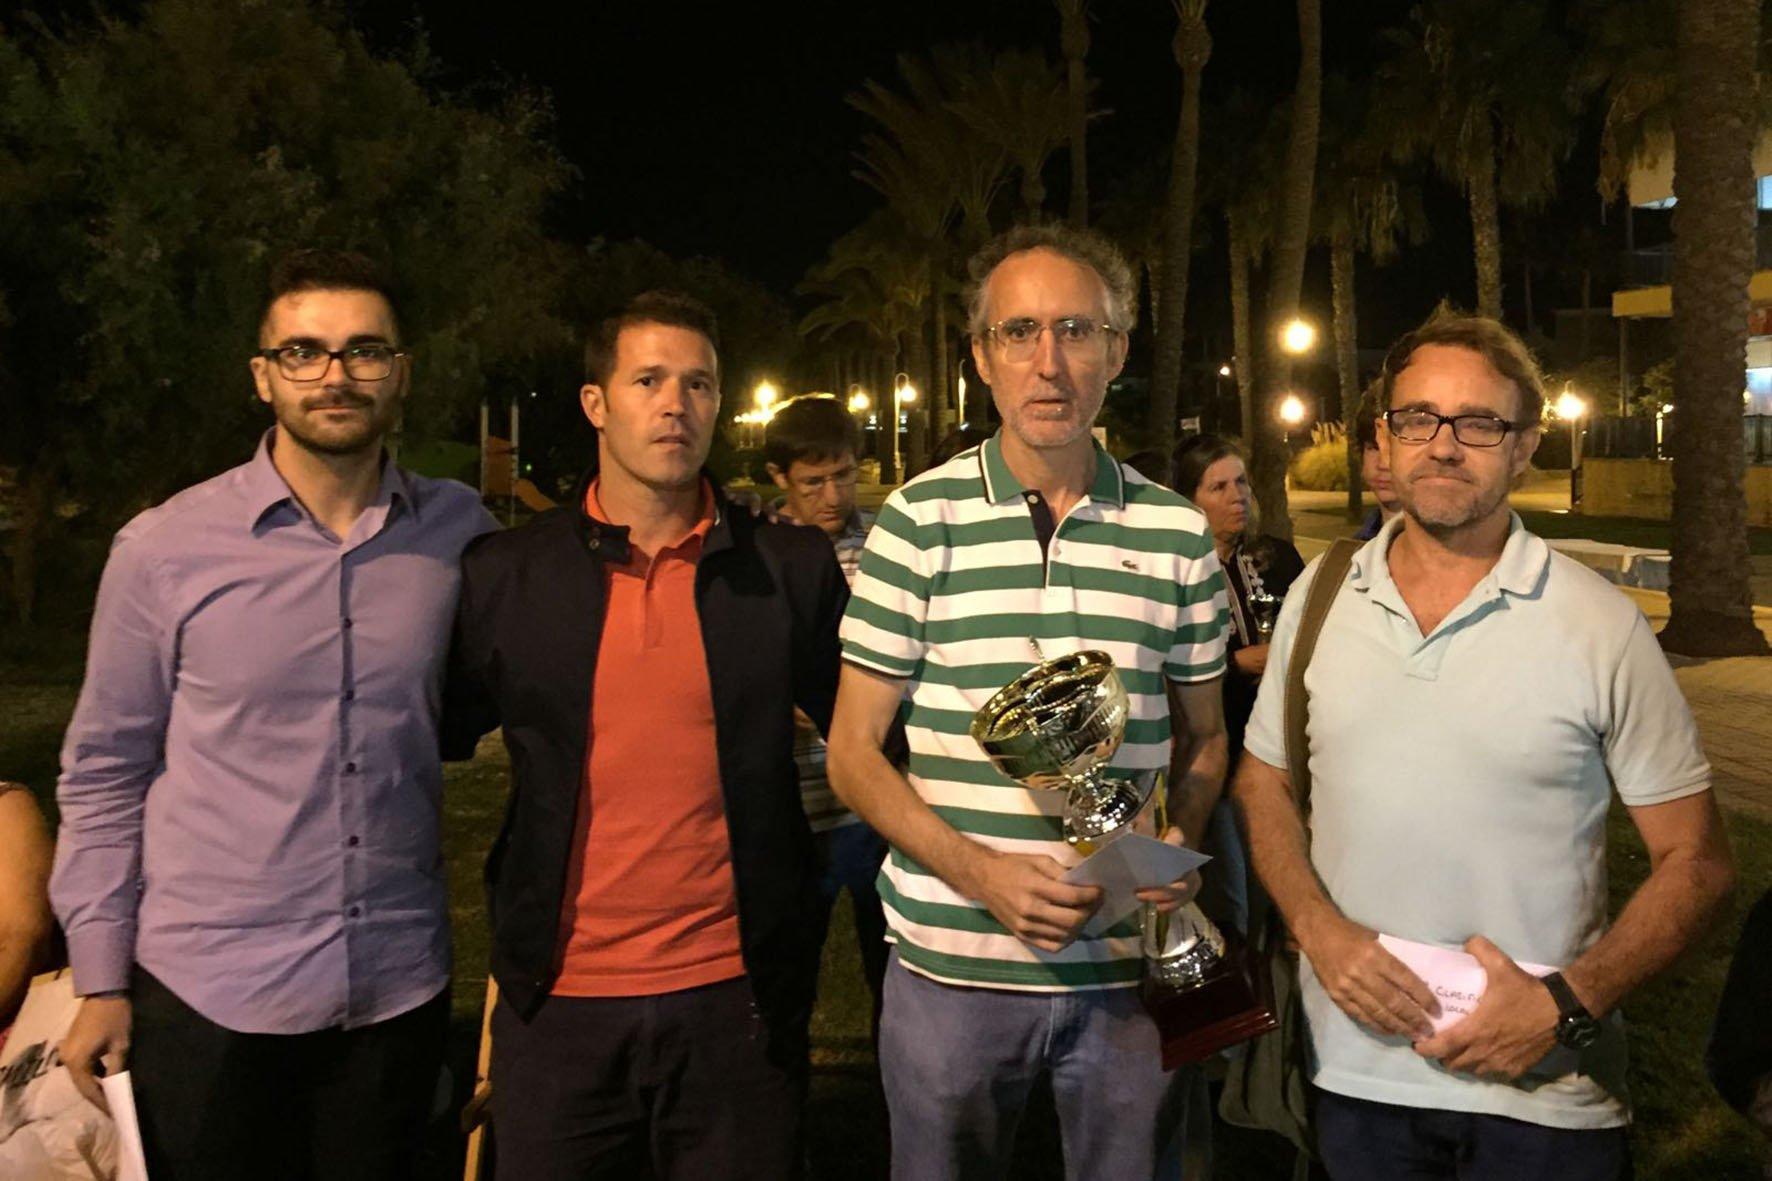 El vencedor general del Circuito, Enrique Biedma